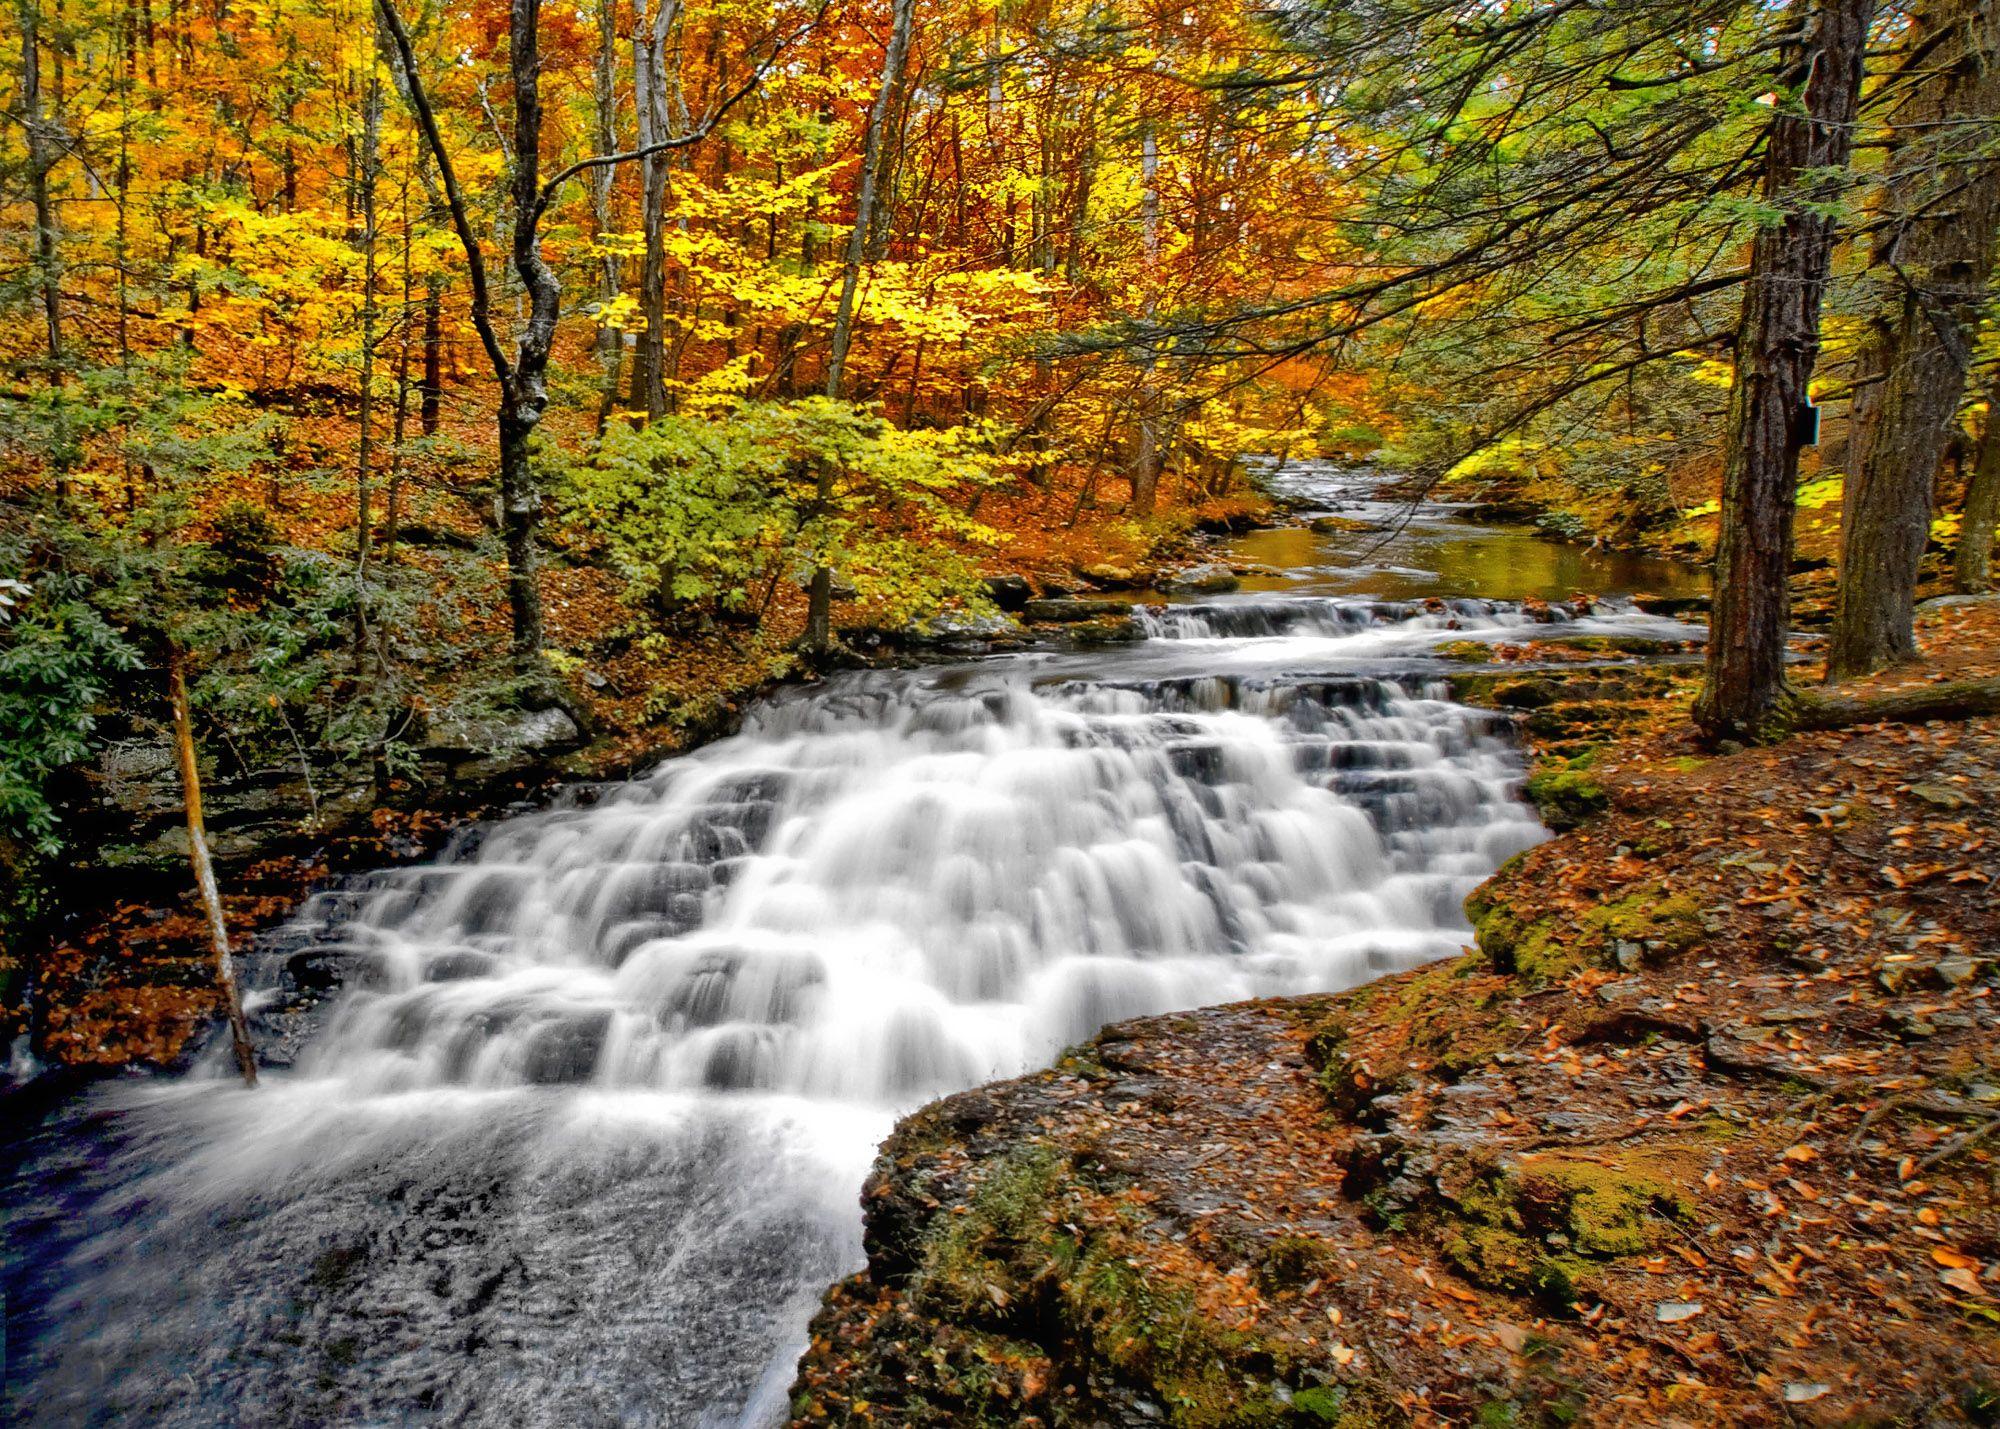 Bushkill Falls PA | Fall | Pinterest | Bushkill falls pa